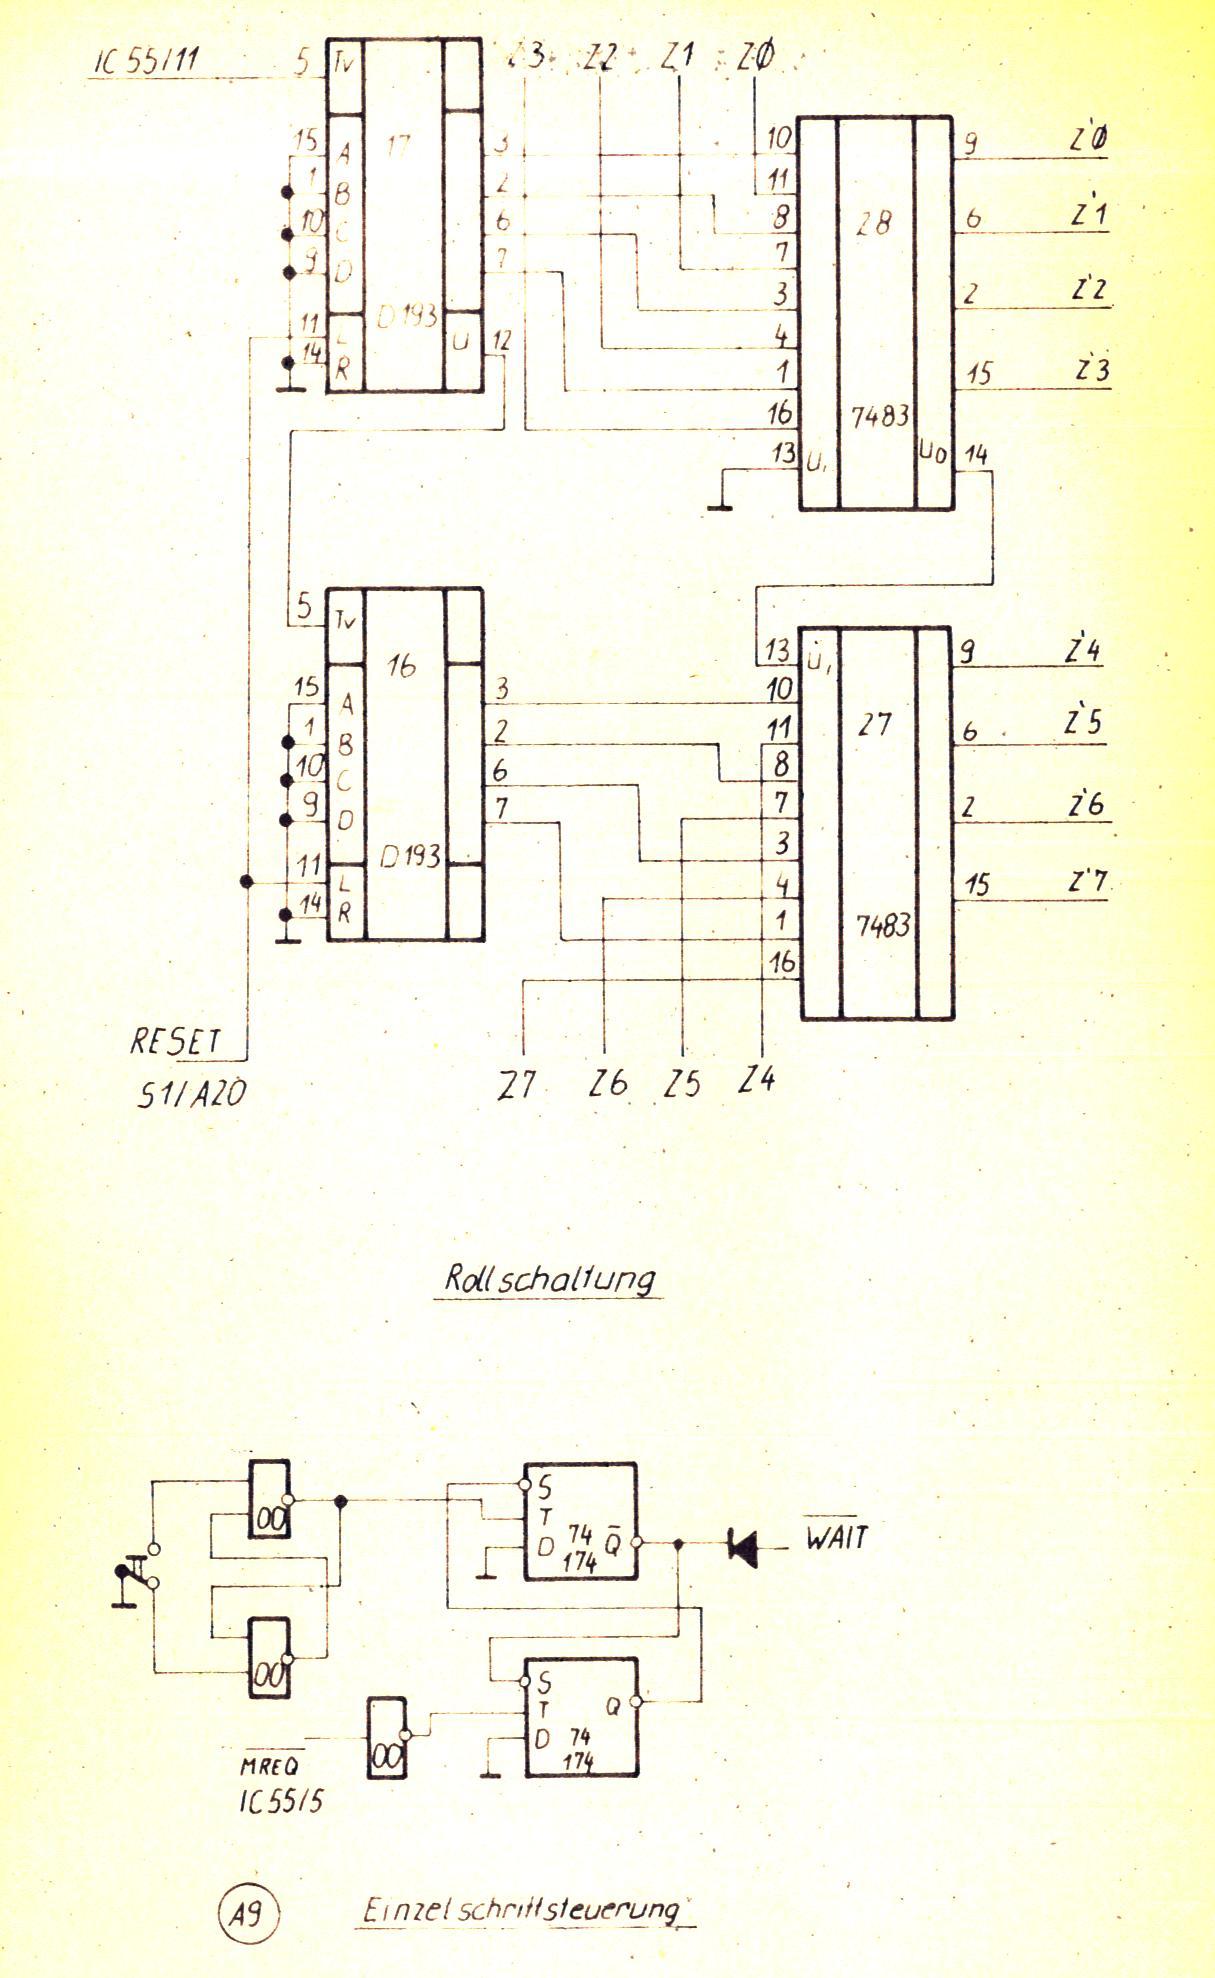 Groß Handwerker Schaltplan Ideen - Der Schaltplan - triangre.info